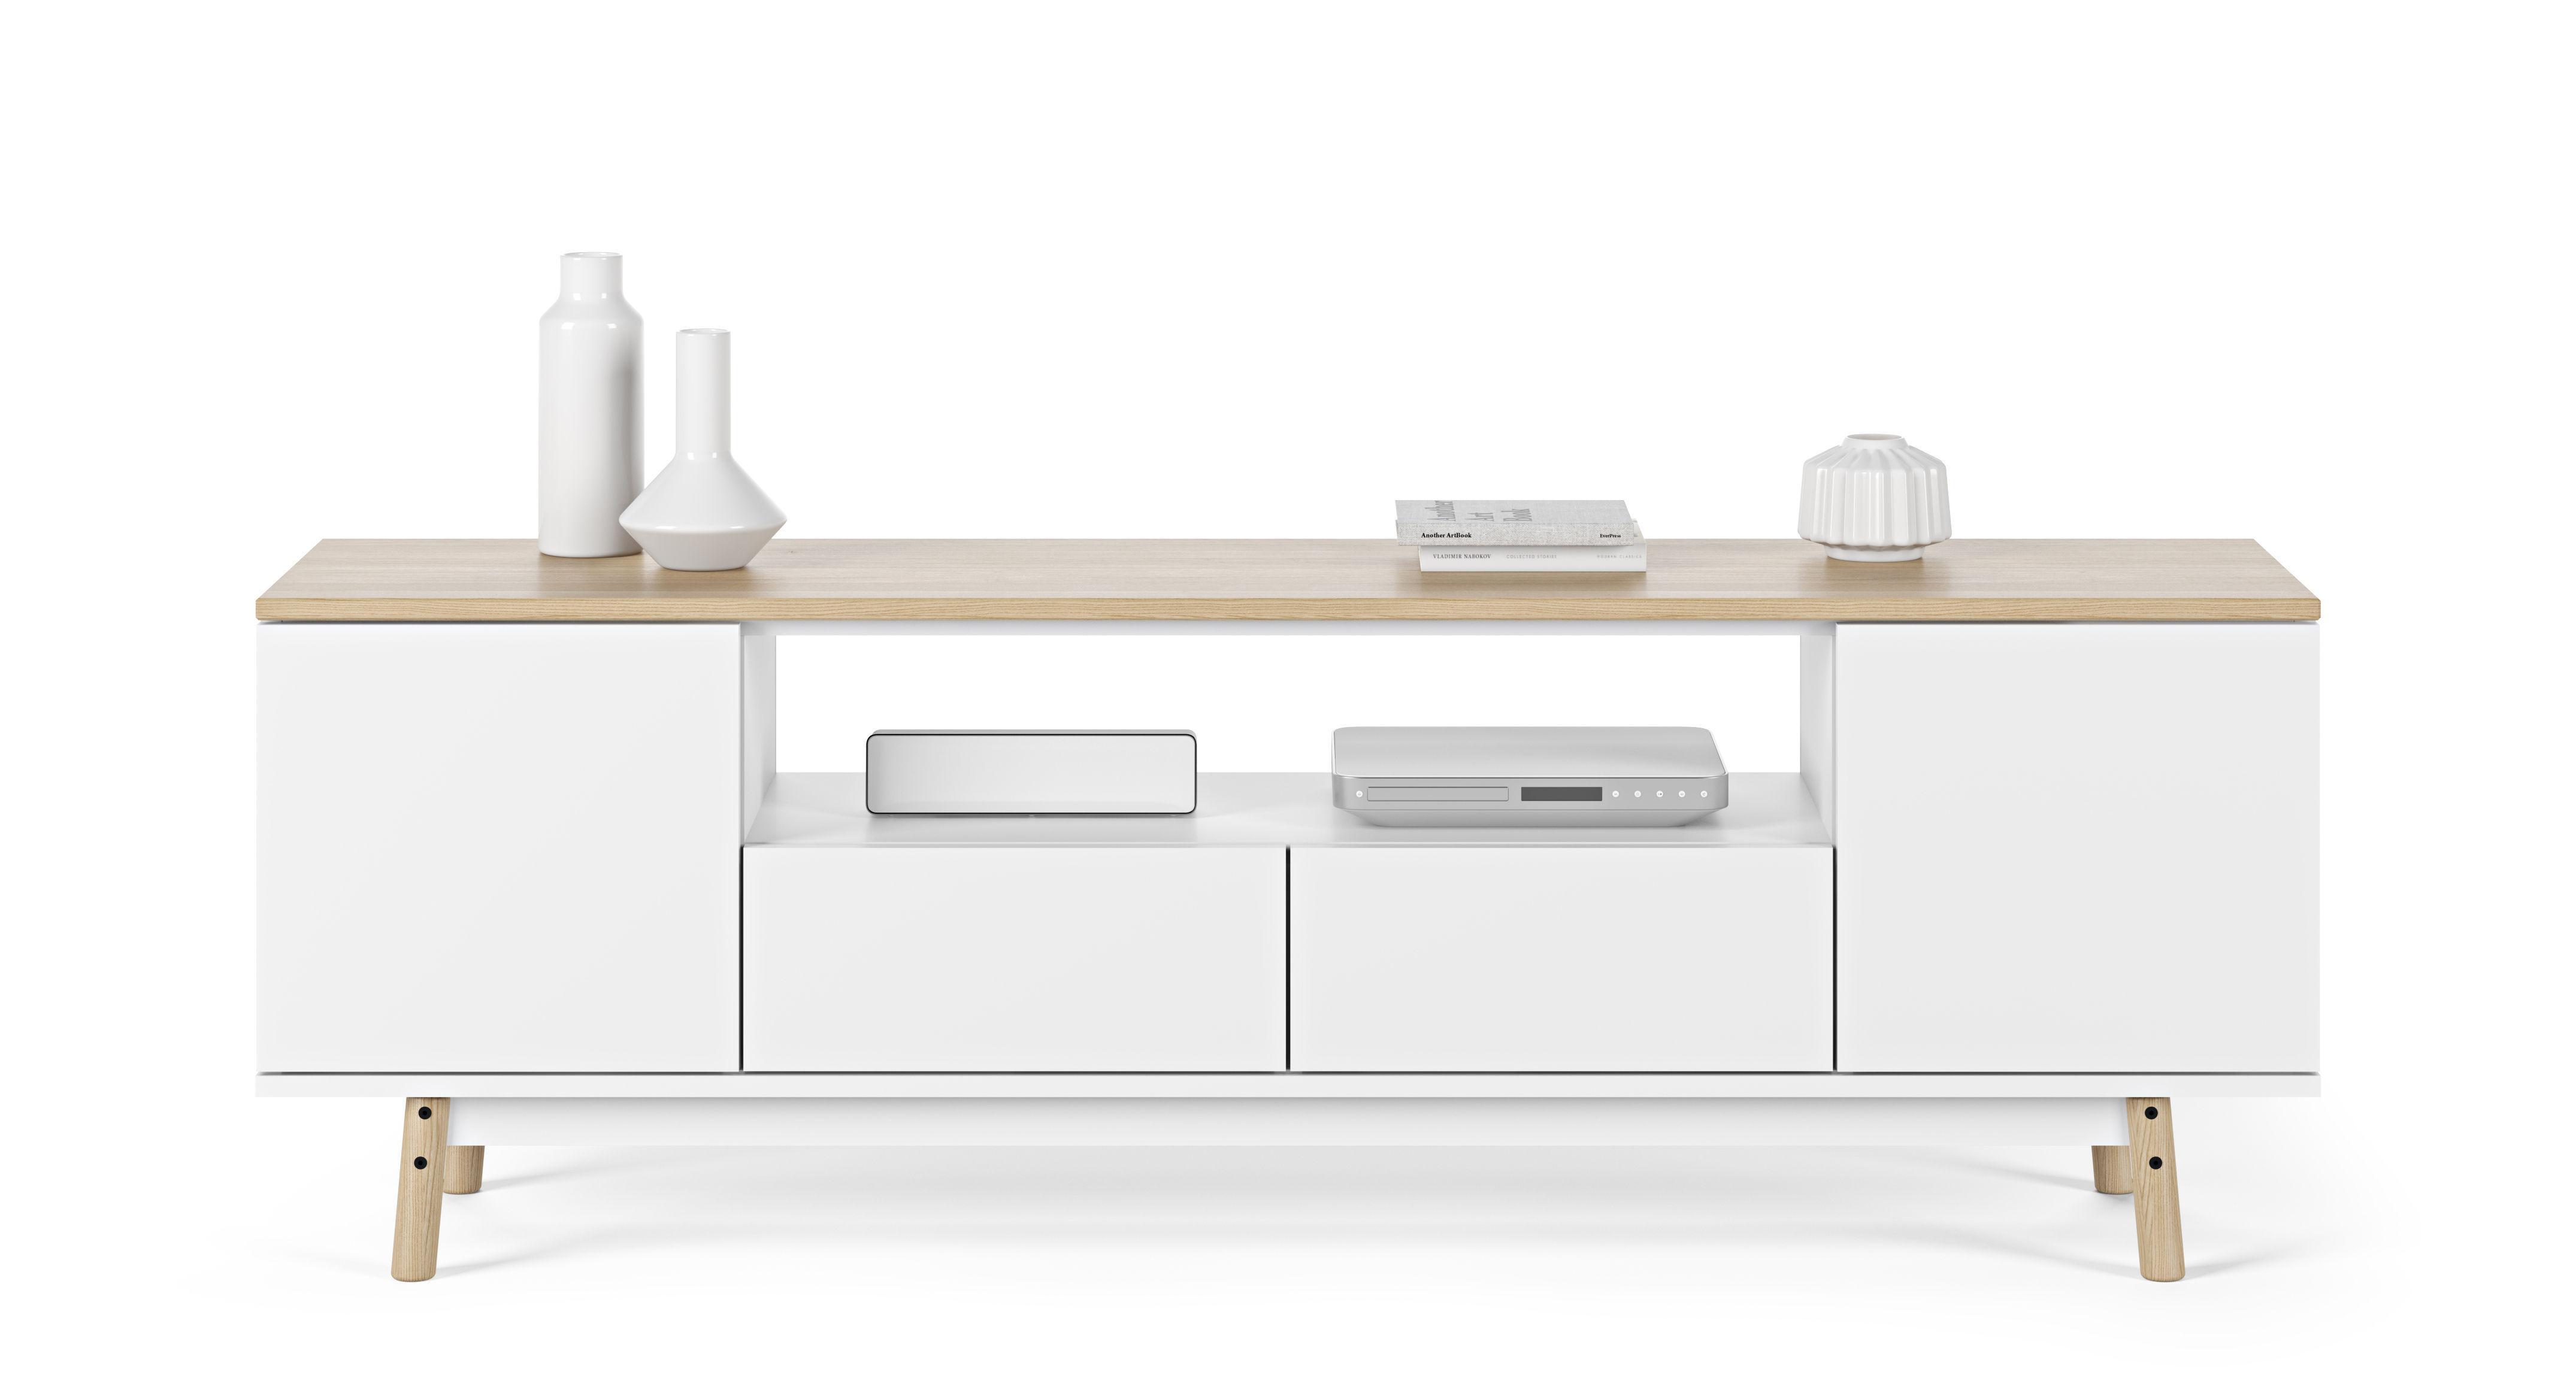 meuble tv milan ch ne l 185 cm plateau ch ne blanc pop up home made in design. Black Bedroom Furniture Sets. Home Design Ideas